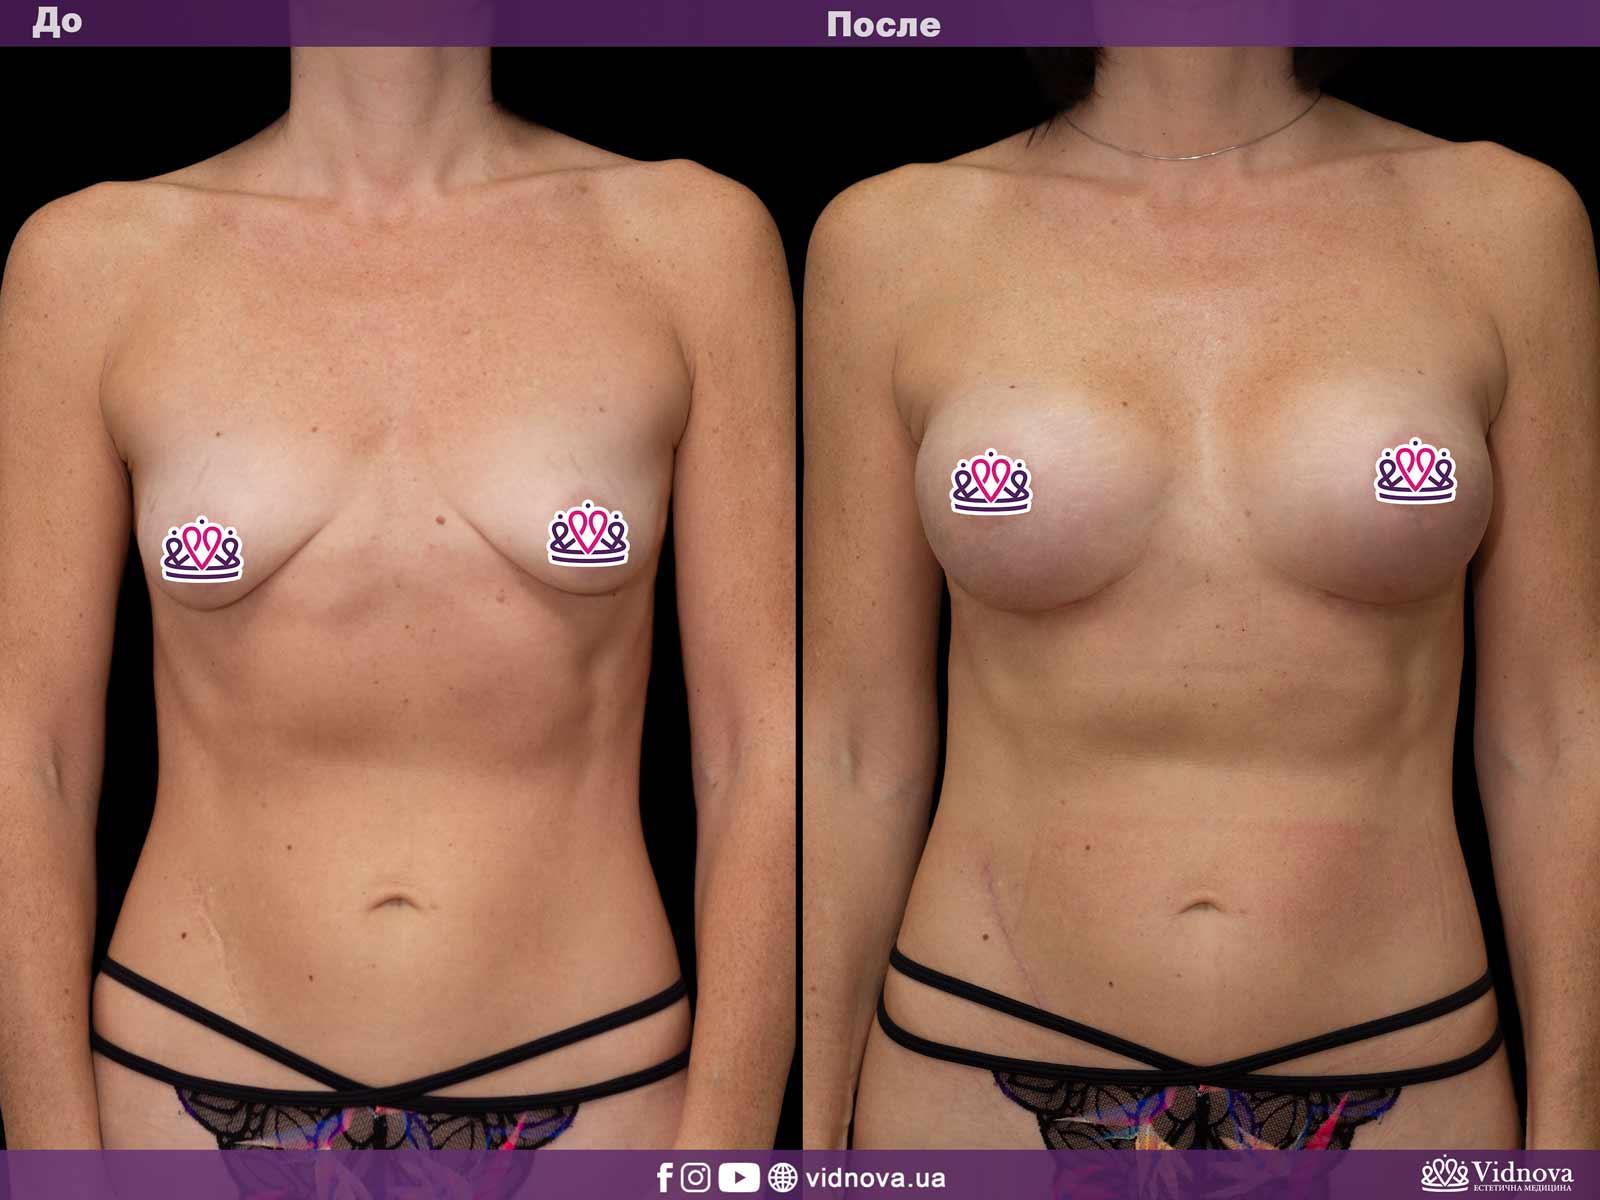 Увеличение груди: Фото ДО и ПОСЛЕ - Пример №32-1 - Клиника Vidnova